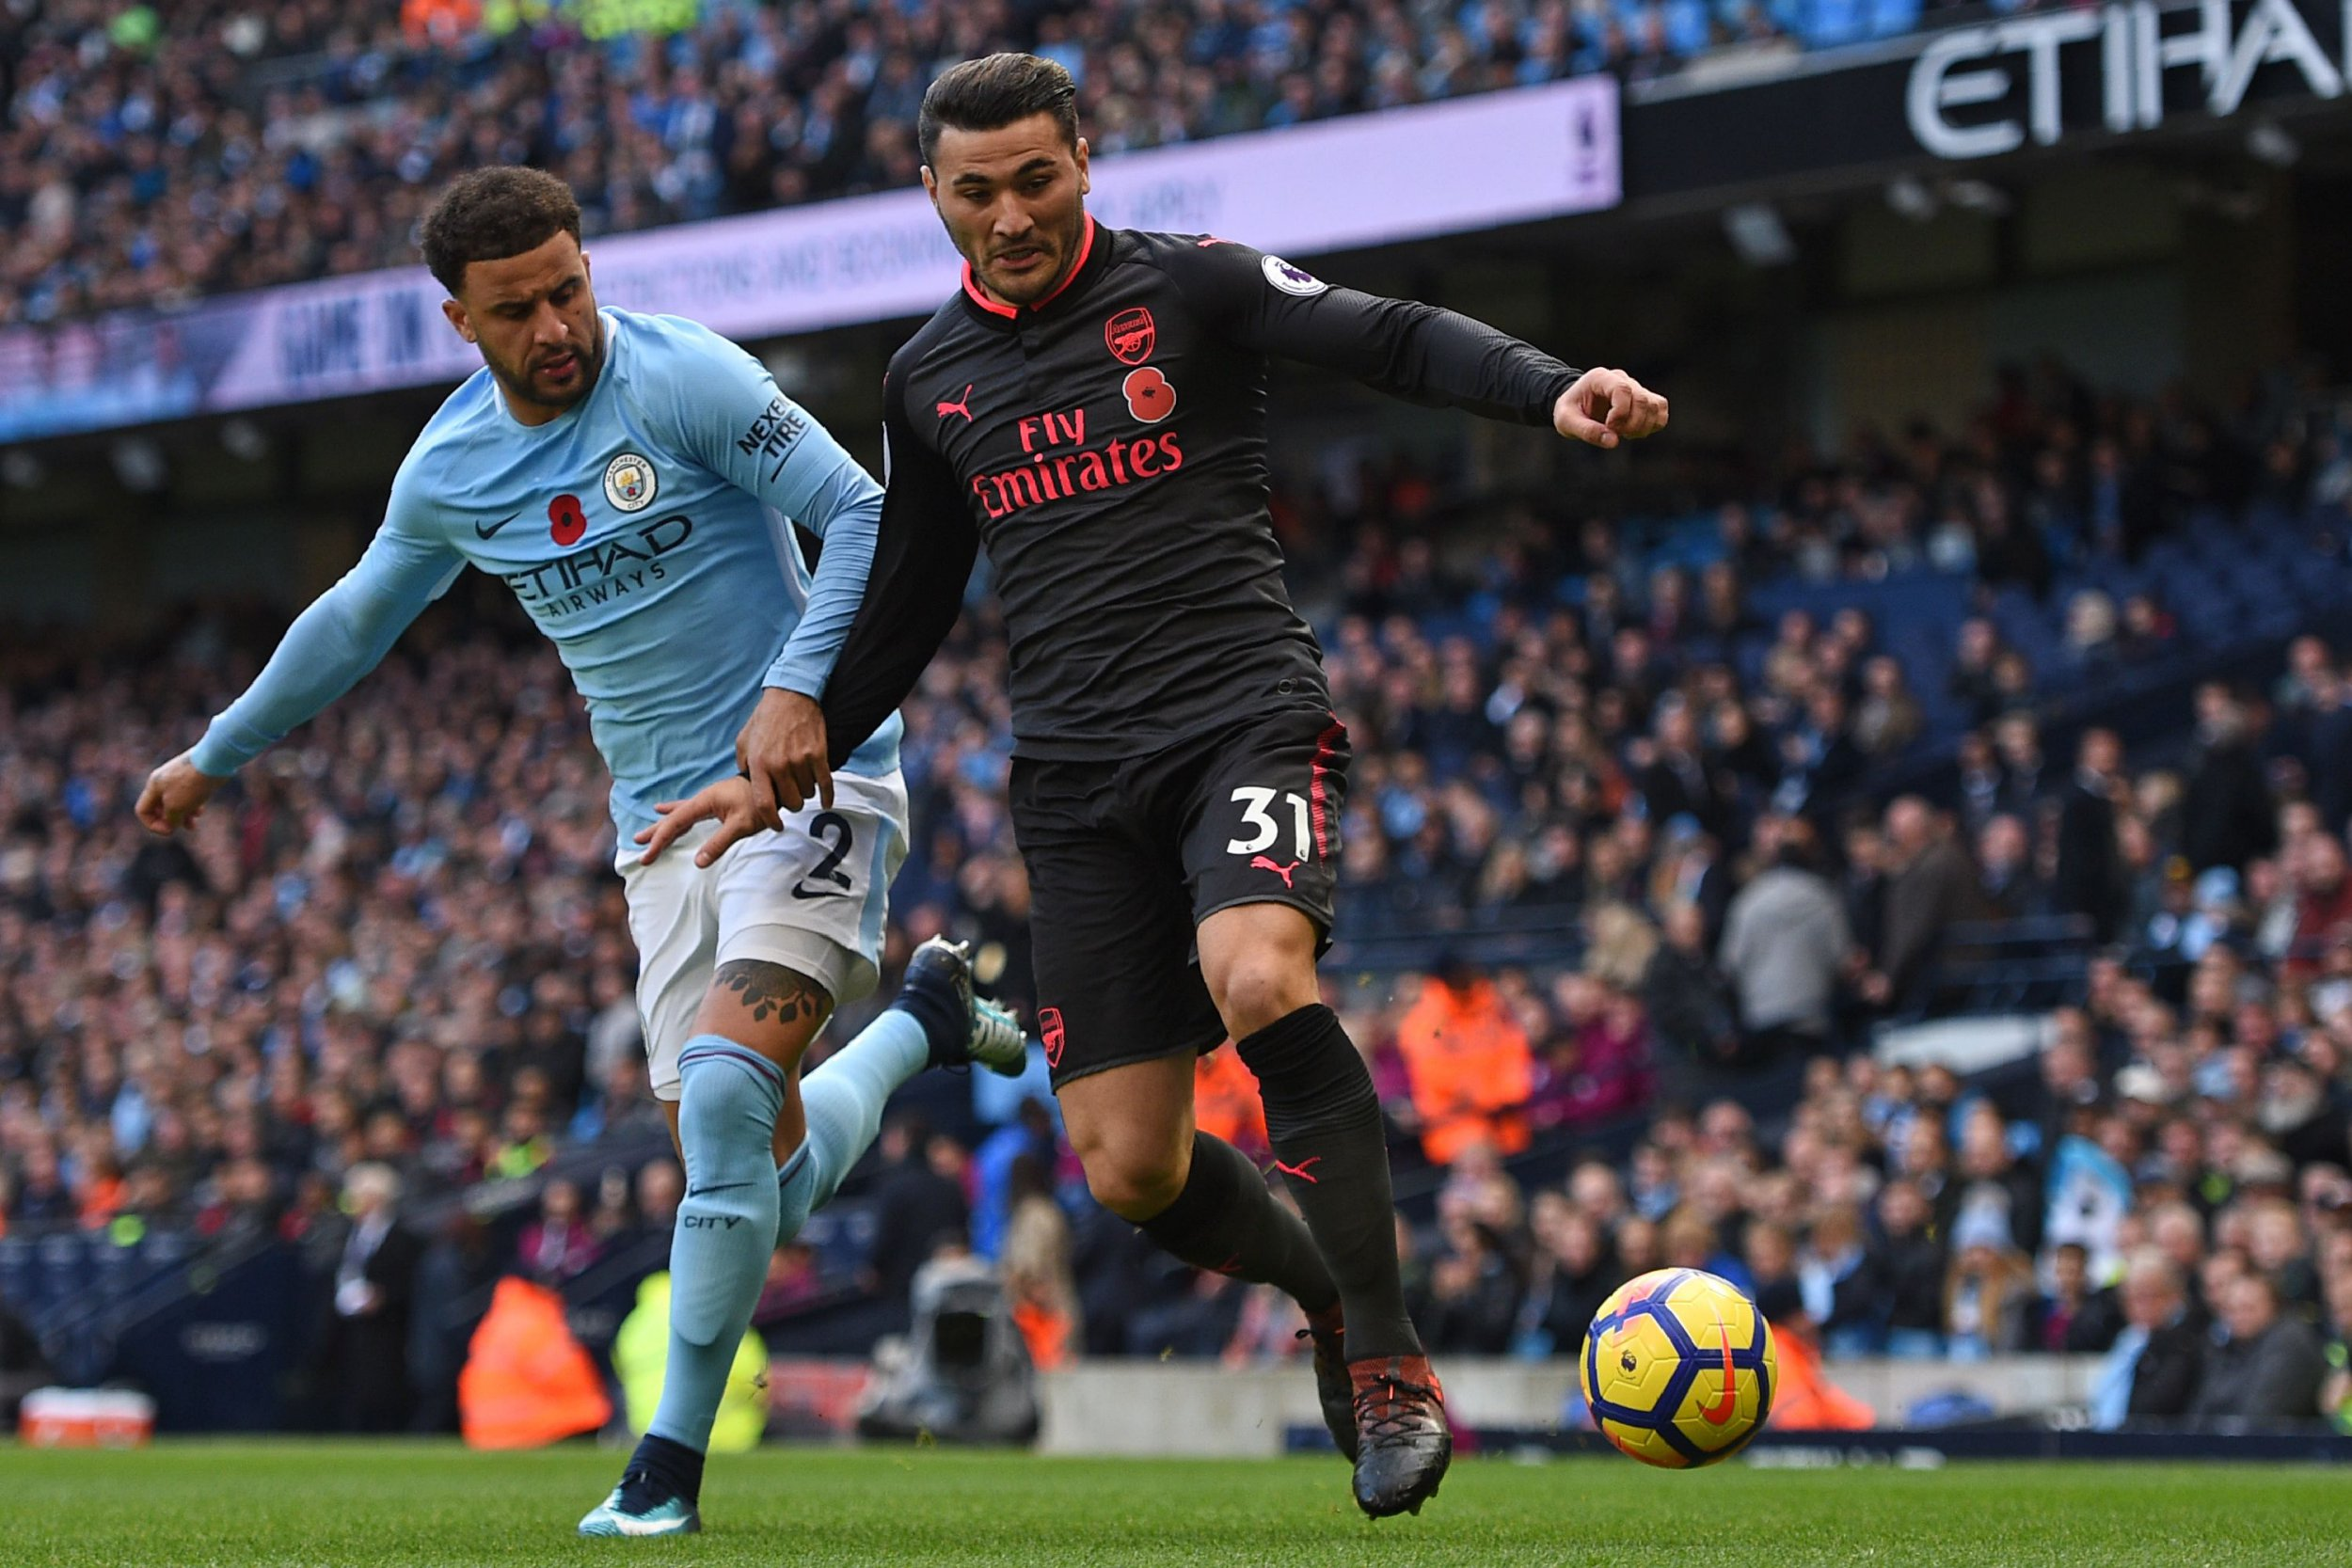 Sead Kolasinac letting David Silva go for Manchester City's opener was 'unforgivable', claims Jamie Carragher